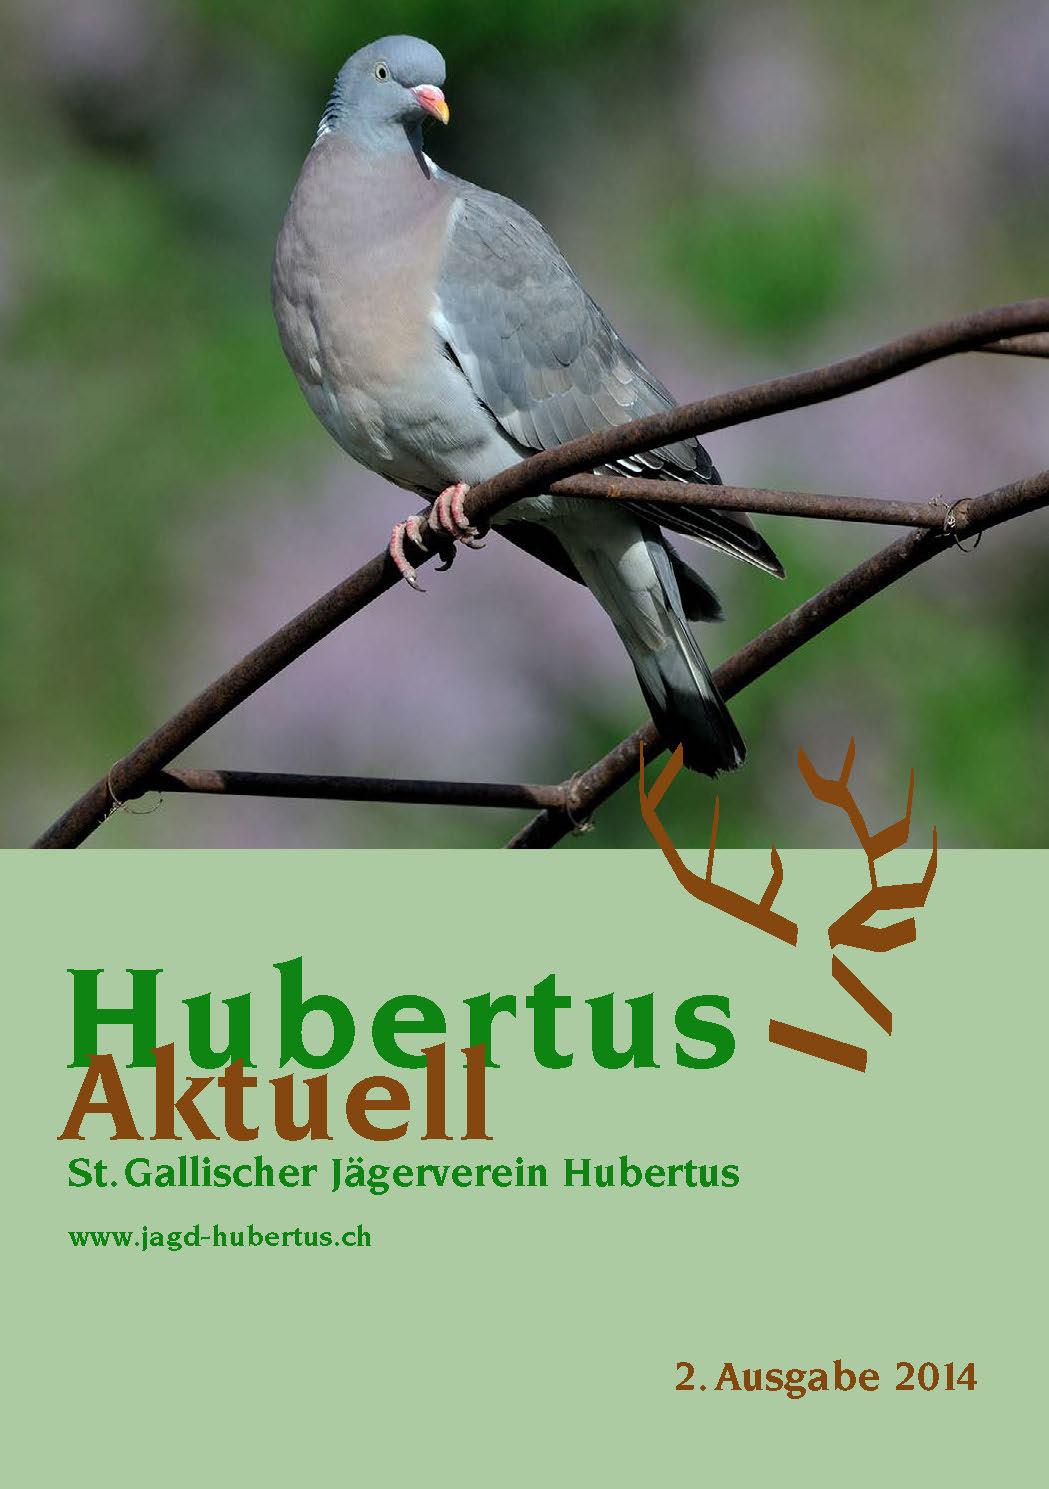 Hubertus Aktuell_2_14_WEB_1